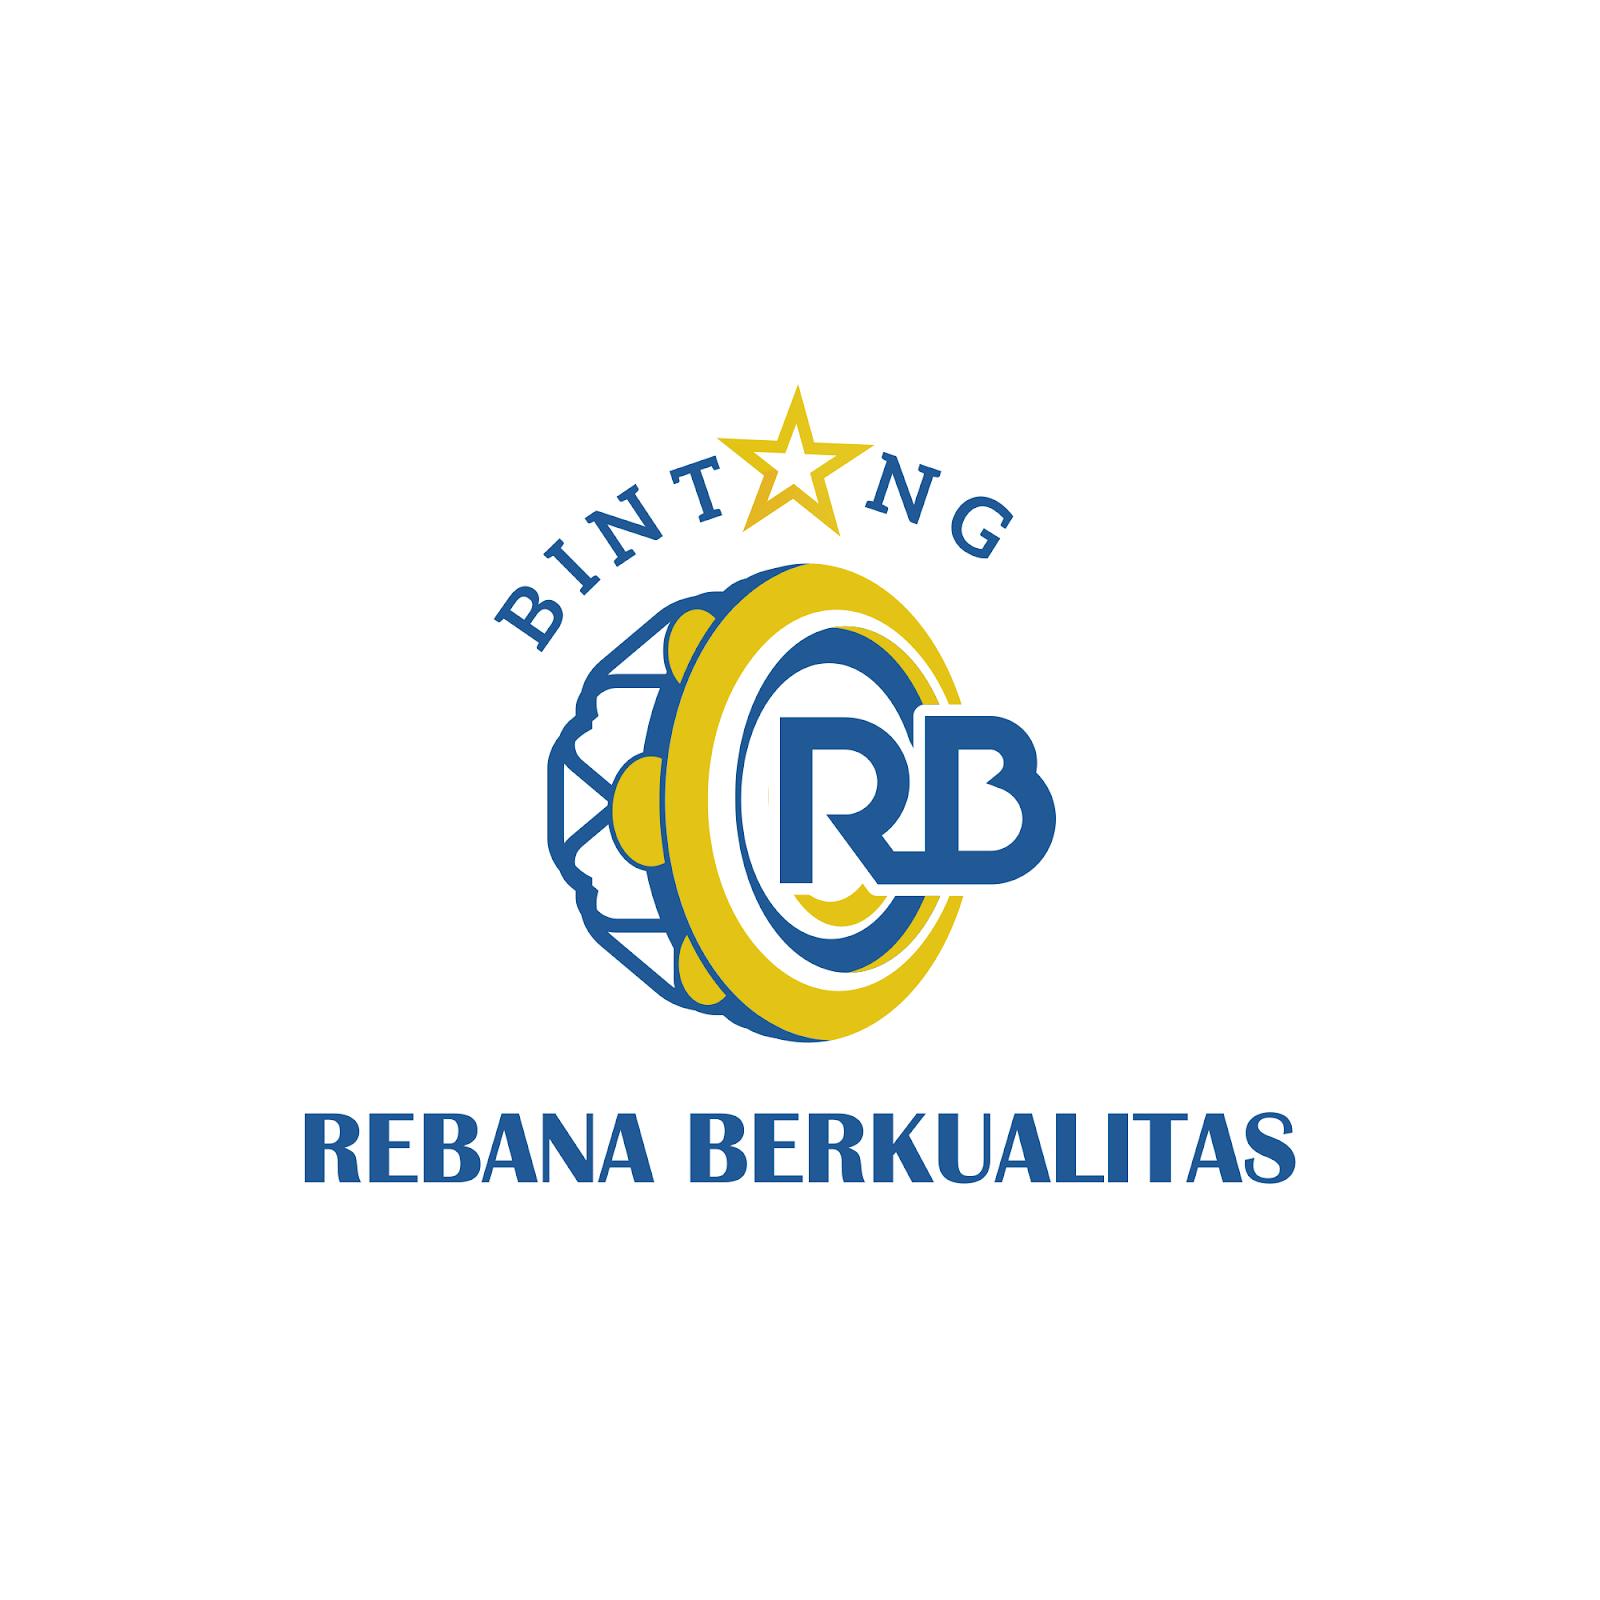 Bintang Rebana Jepara